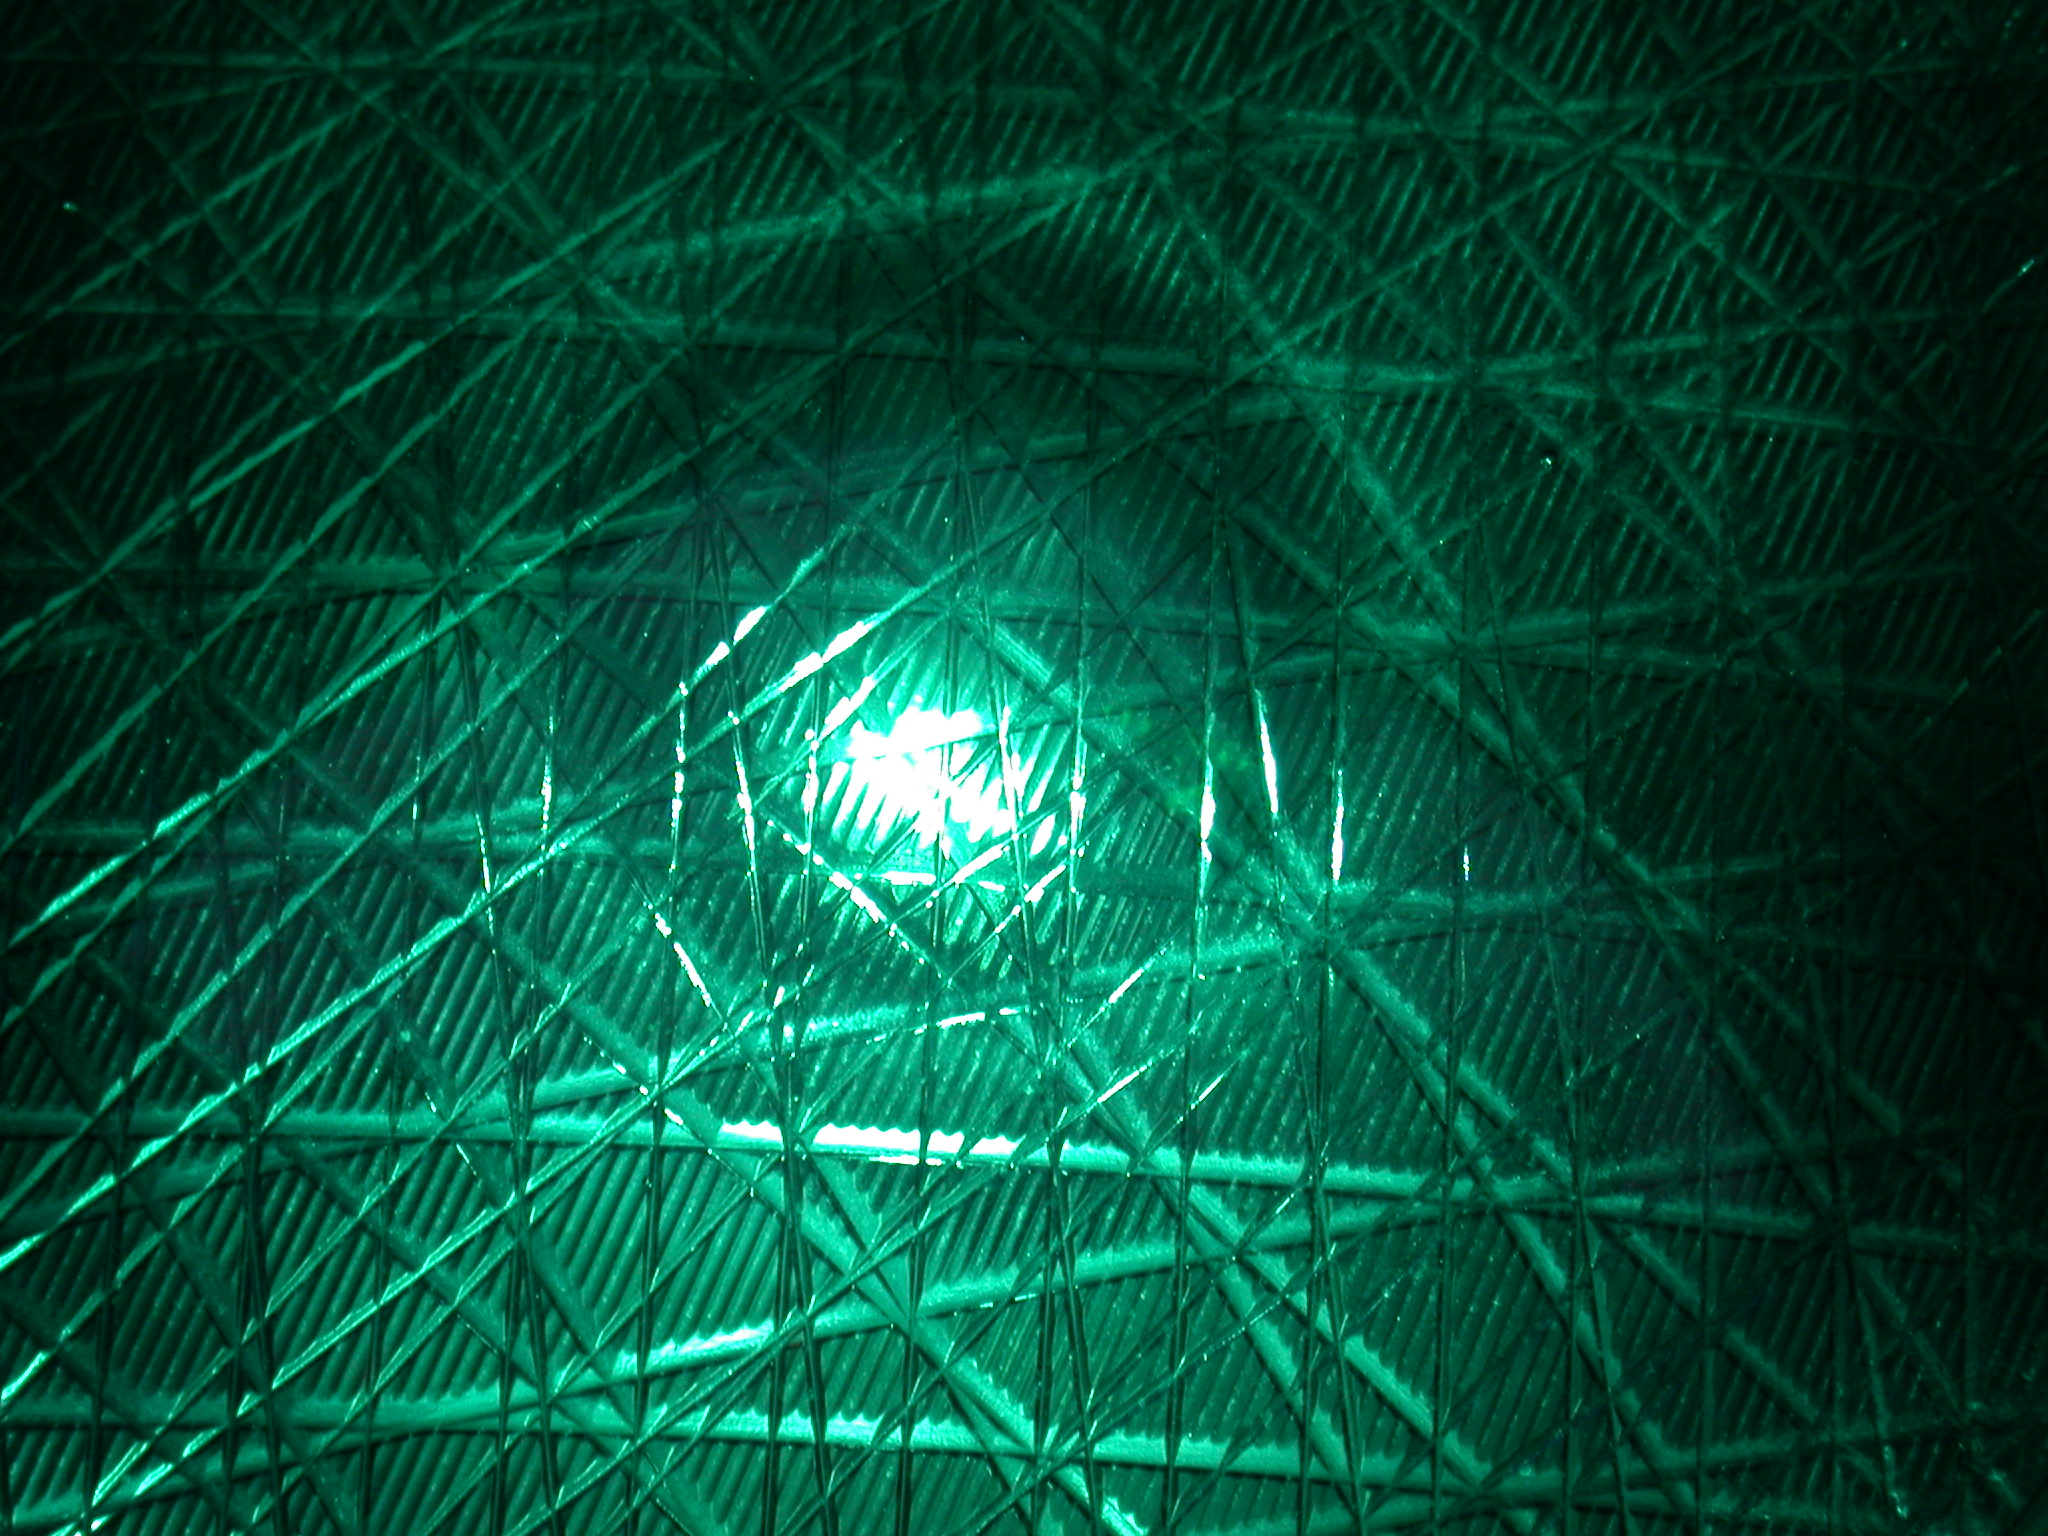 green traffic light up close green plastic